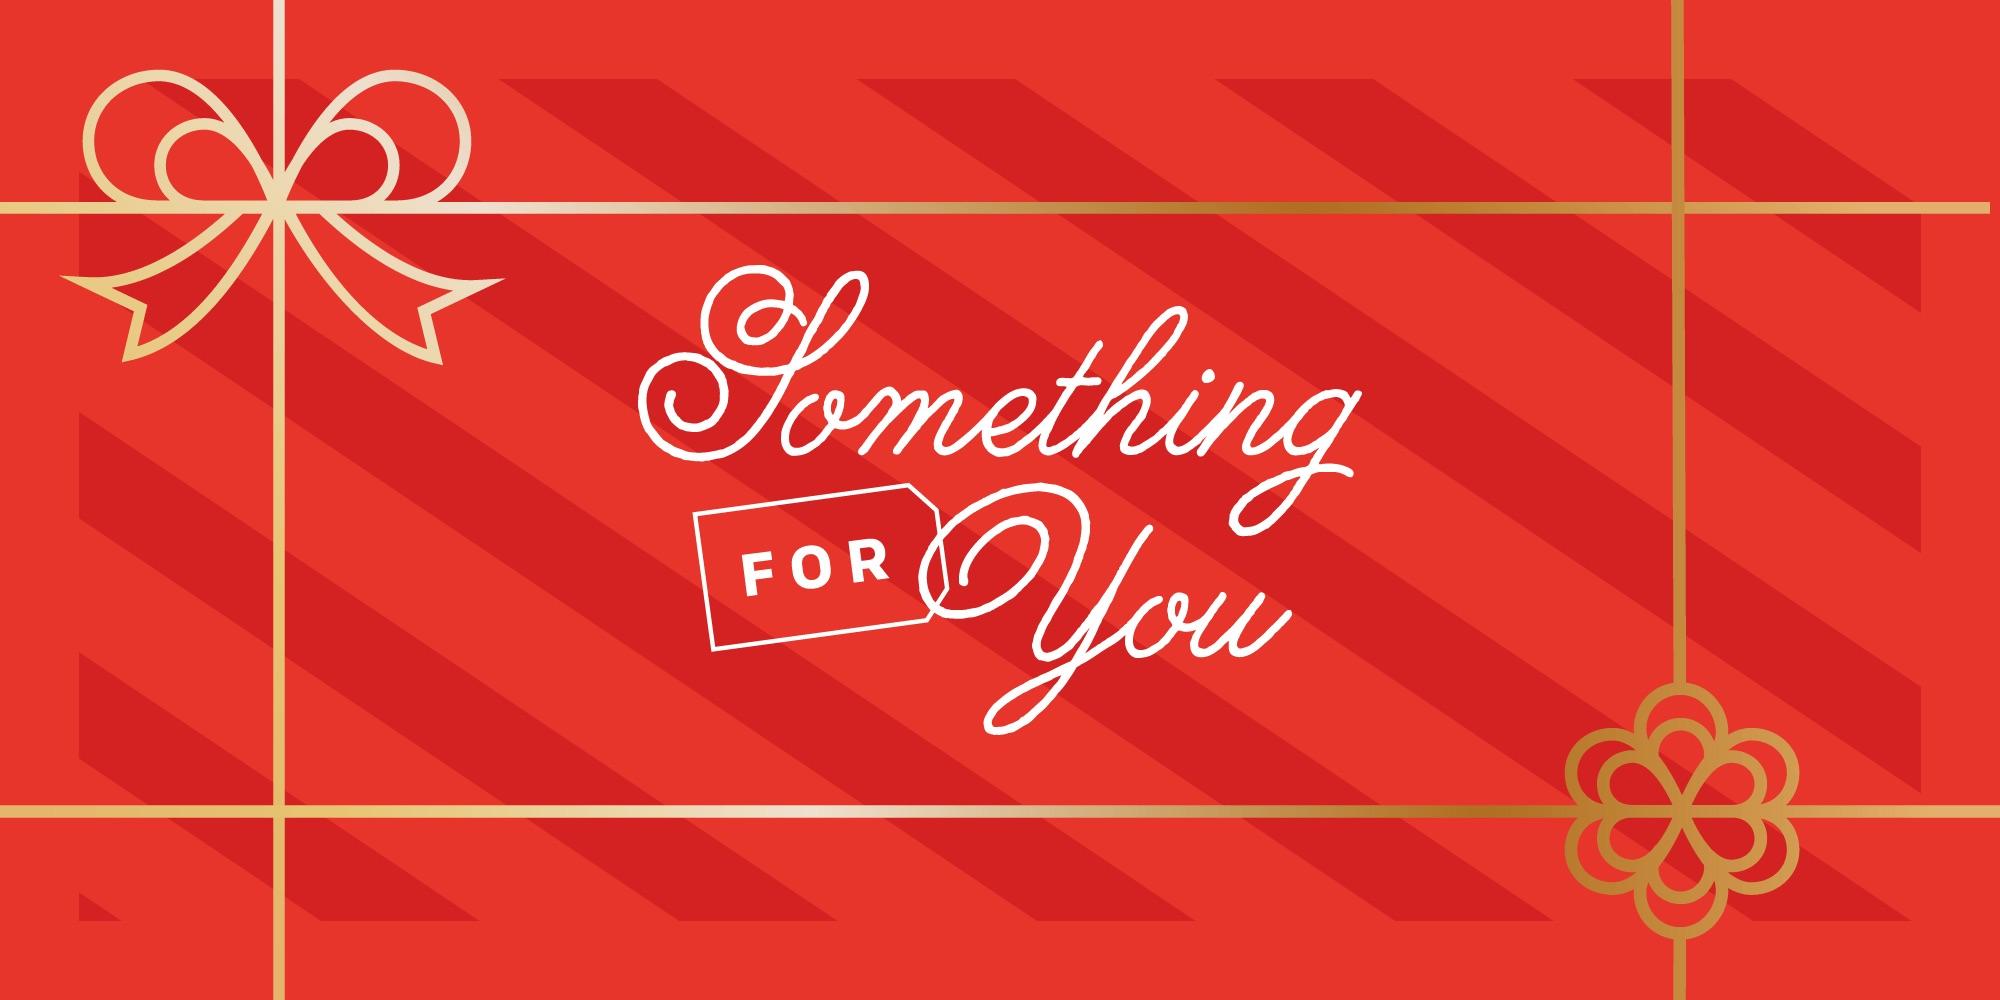 Something for You - Hero 2x1 (JPG)